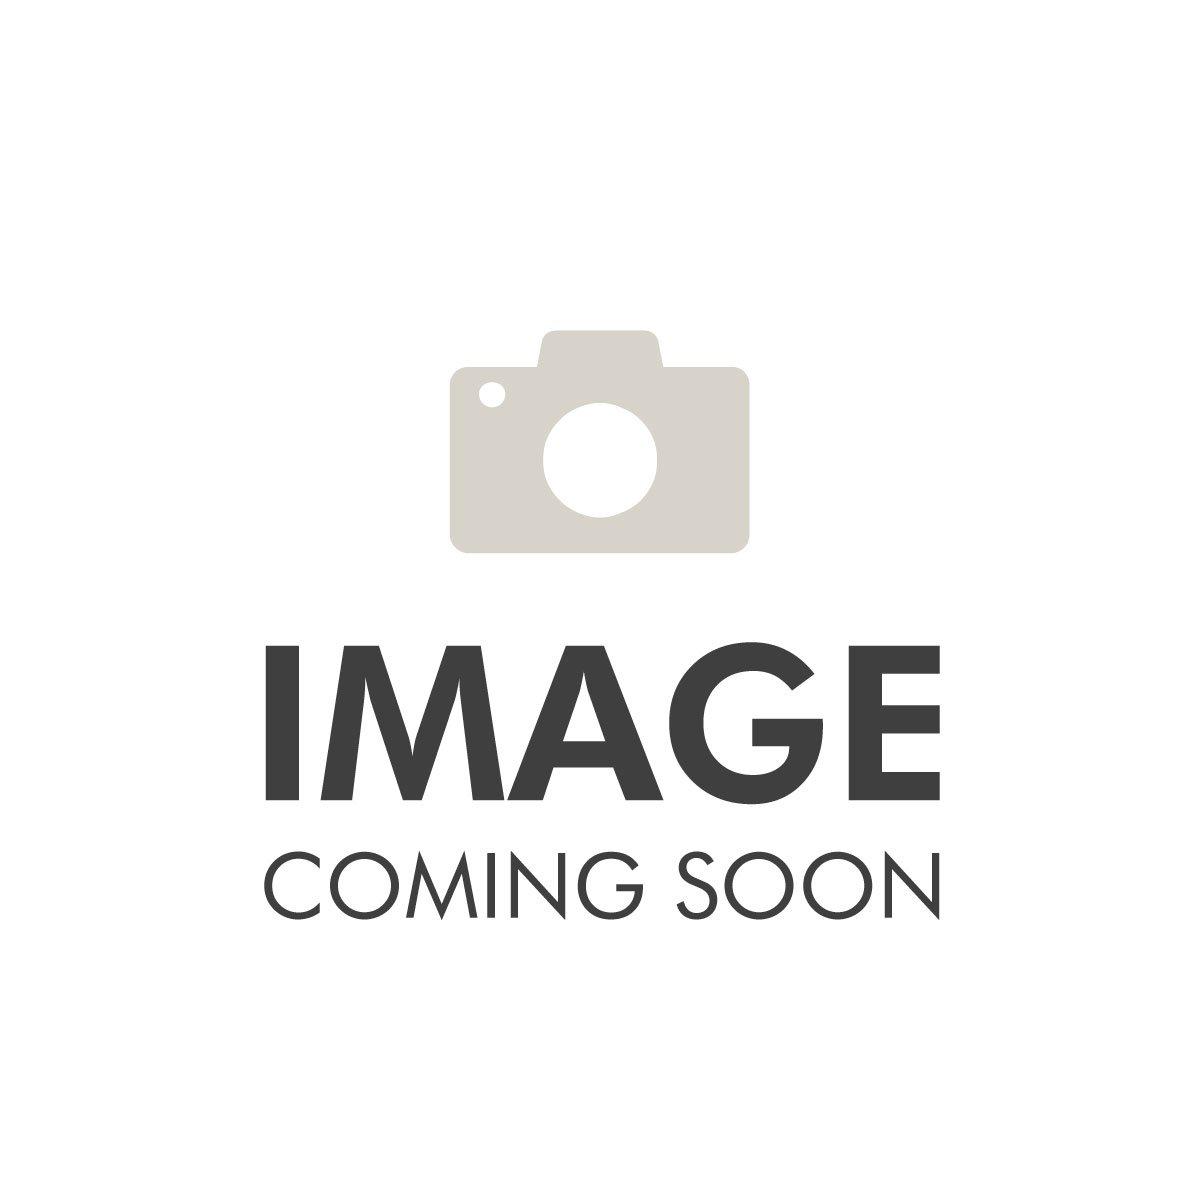 Clarins Gentle Care Roll-on Deodorant 50ml